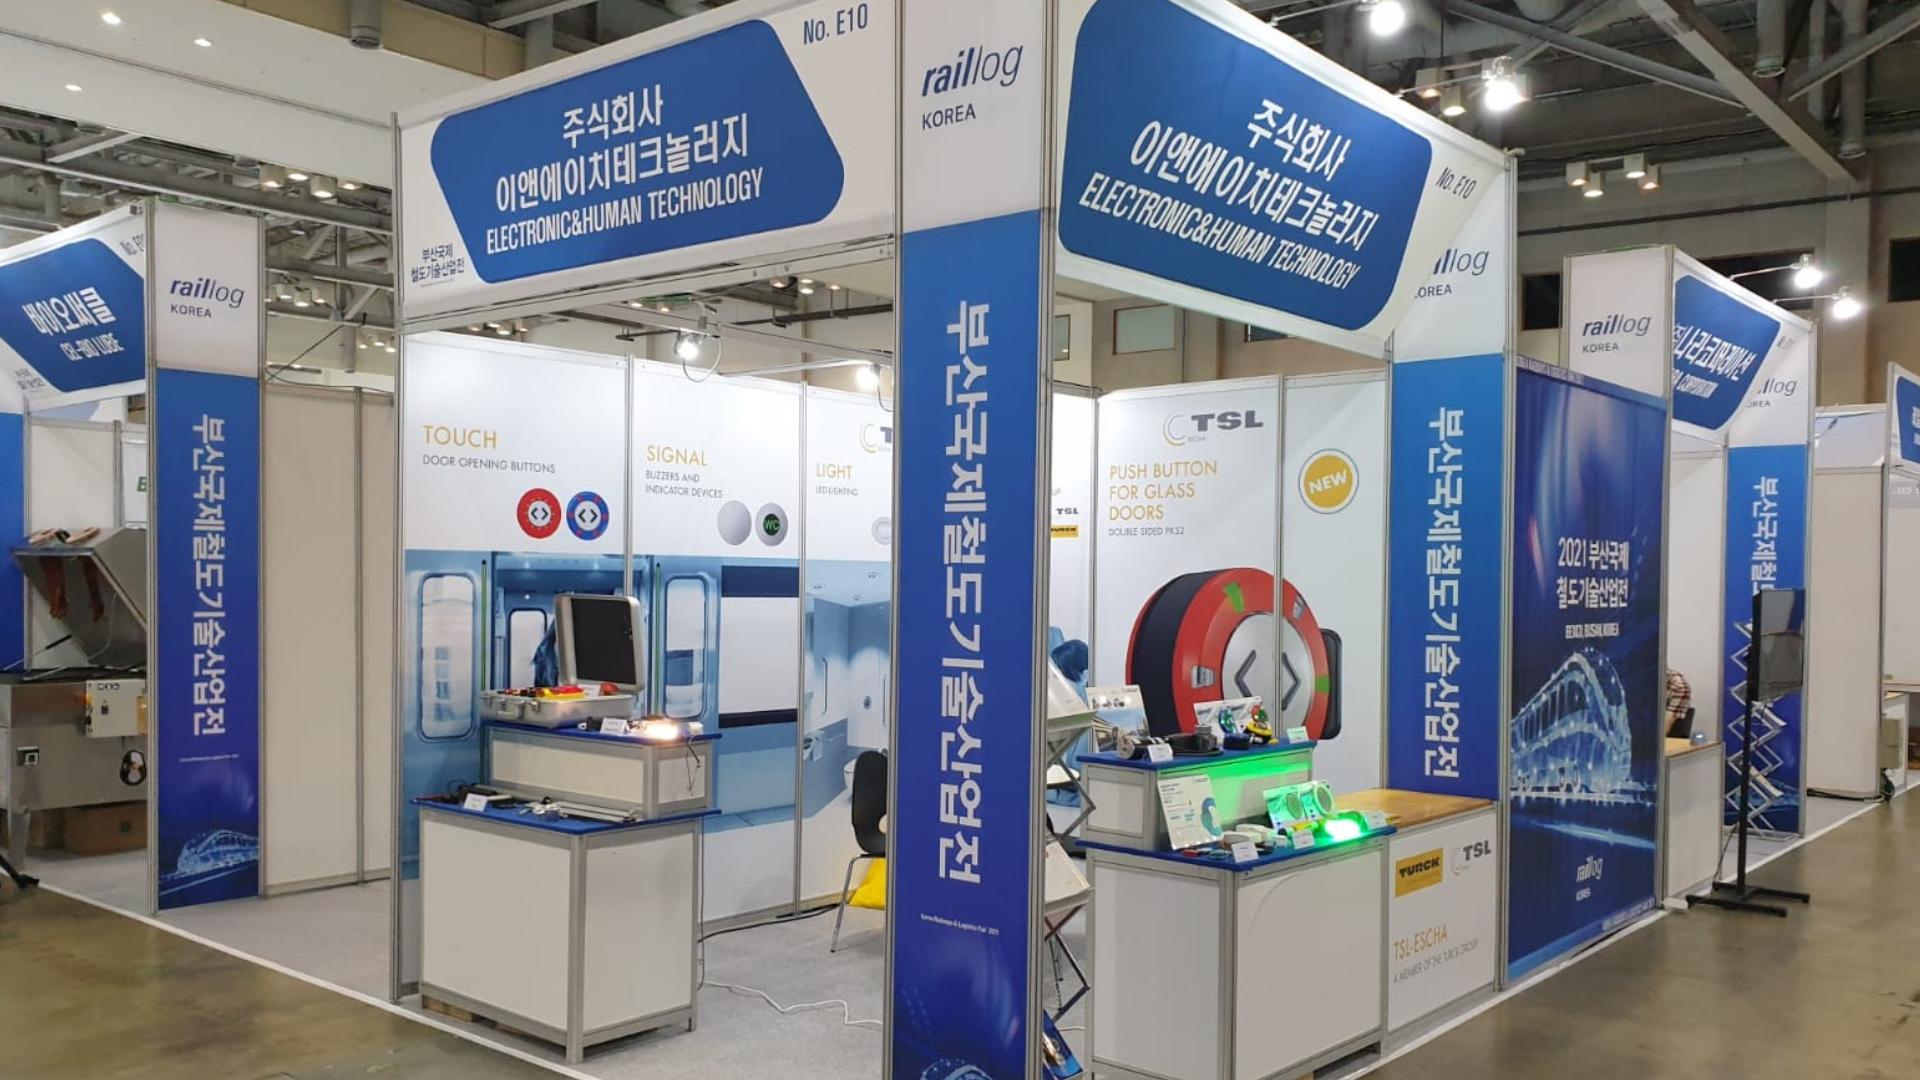 Trade Show Raillog Korea 2021